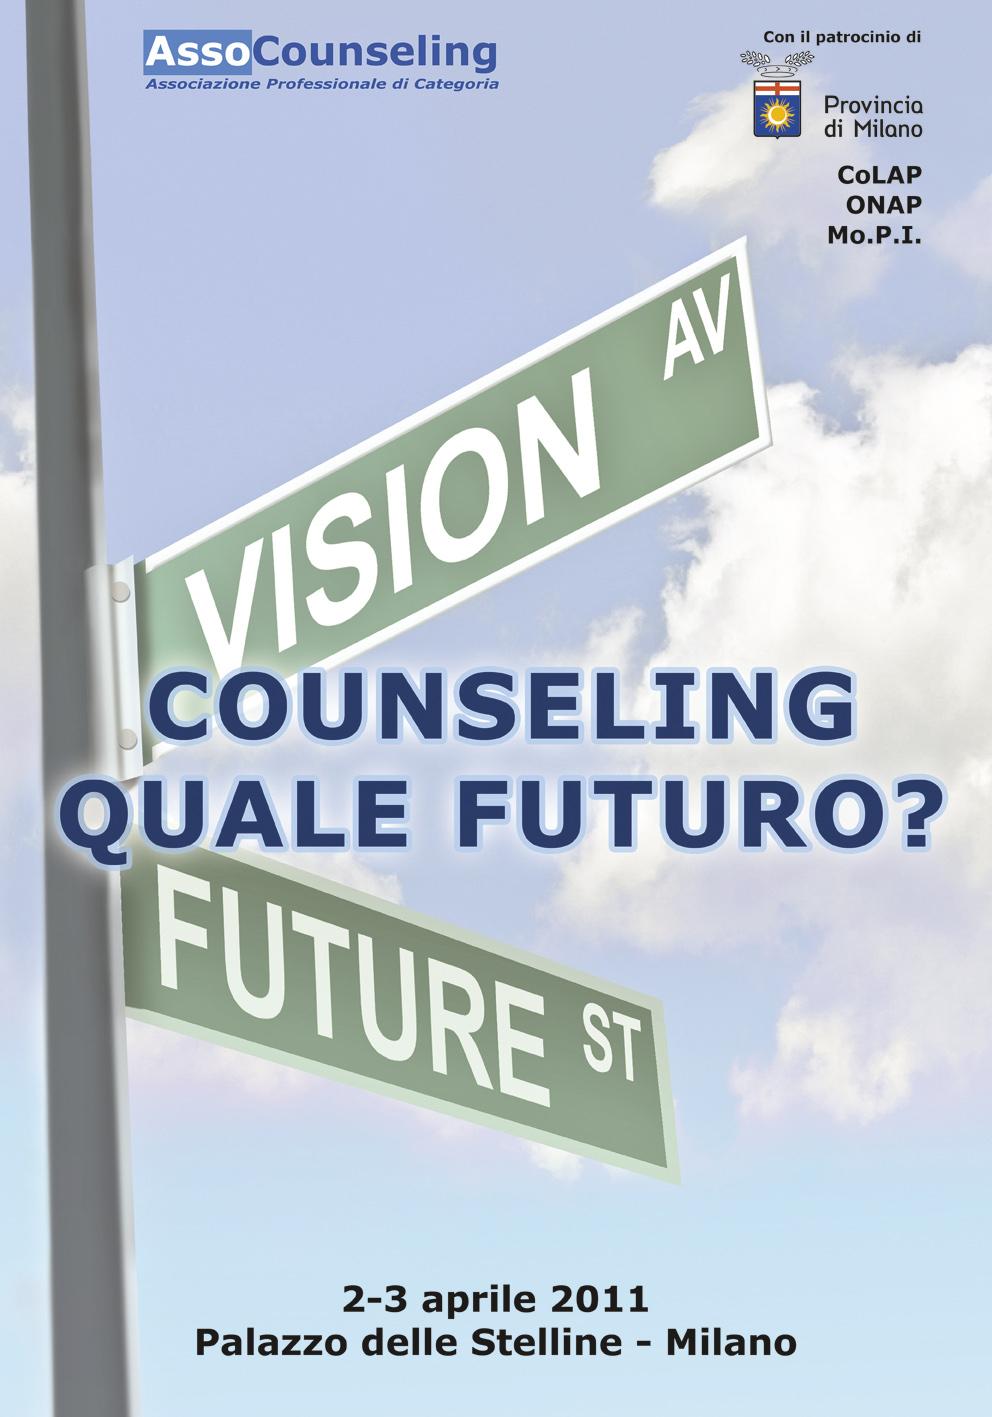 Counseling: quale futuro?